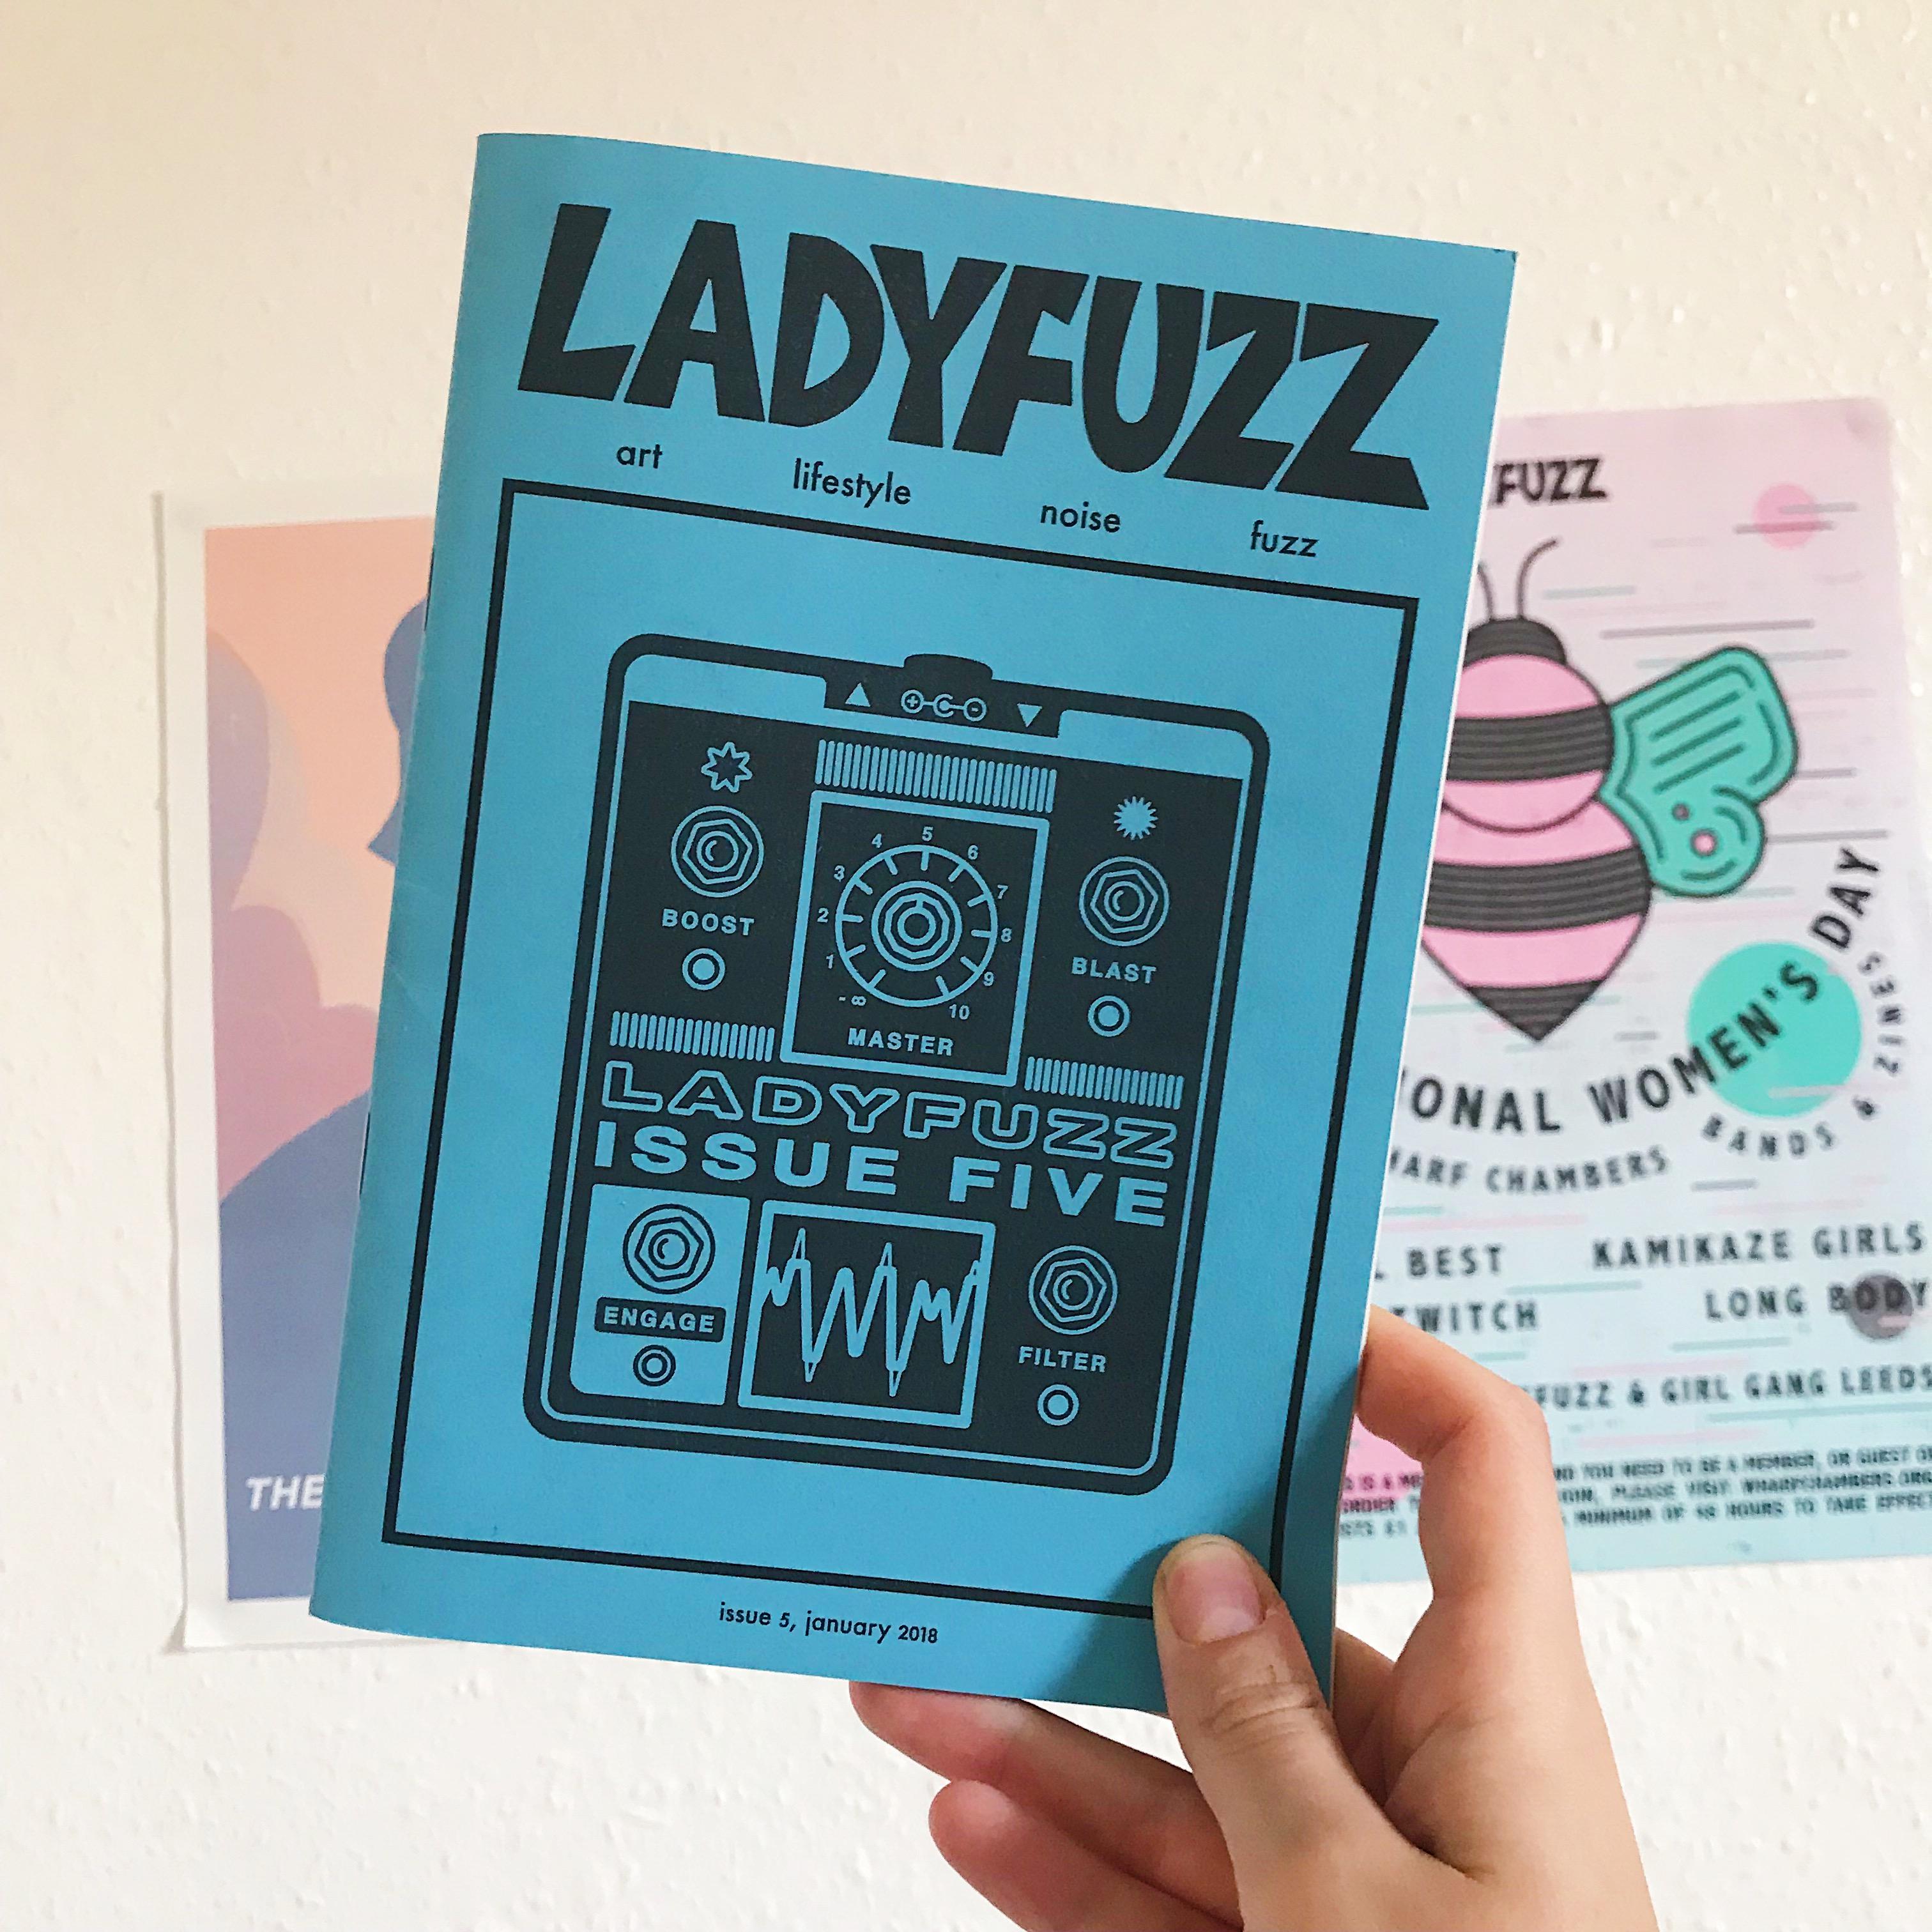 Ladyfuzz Issue #5